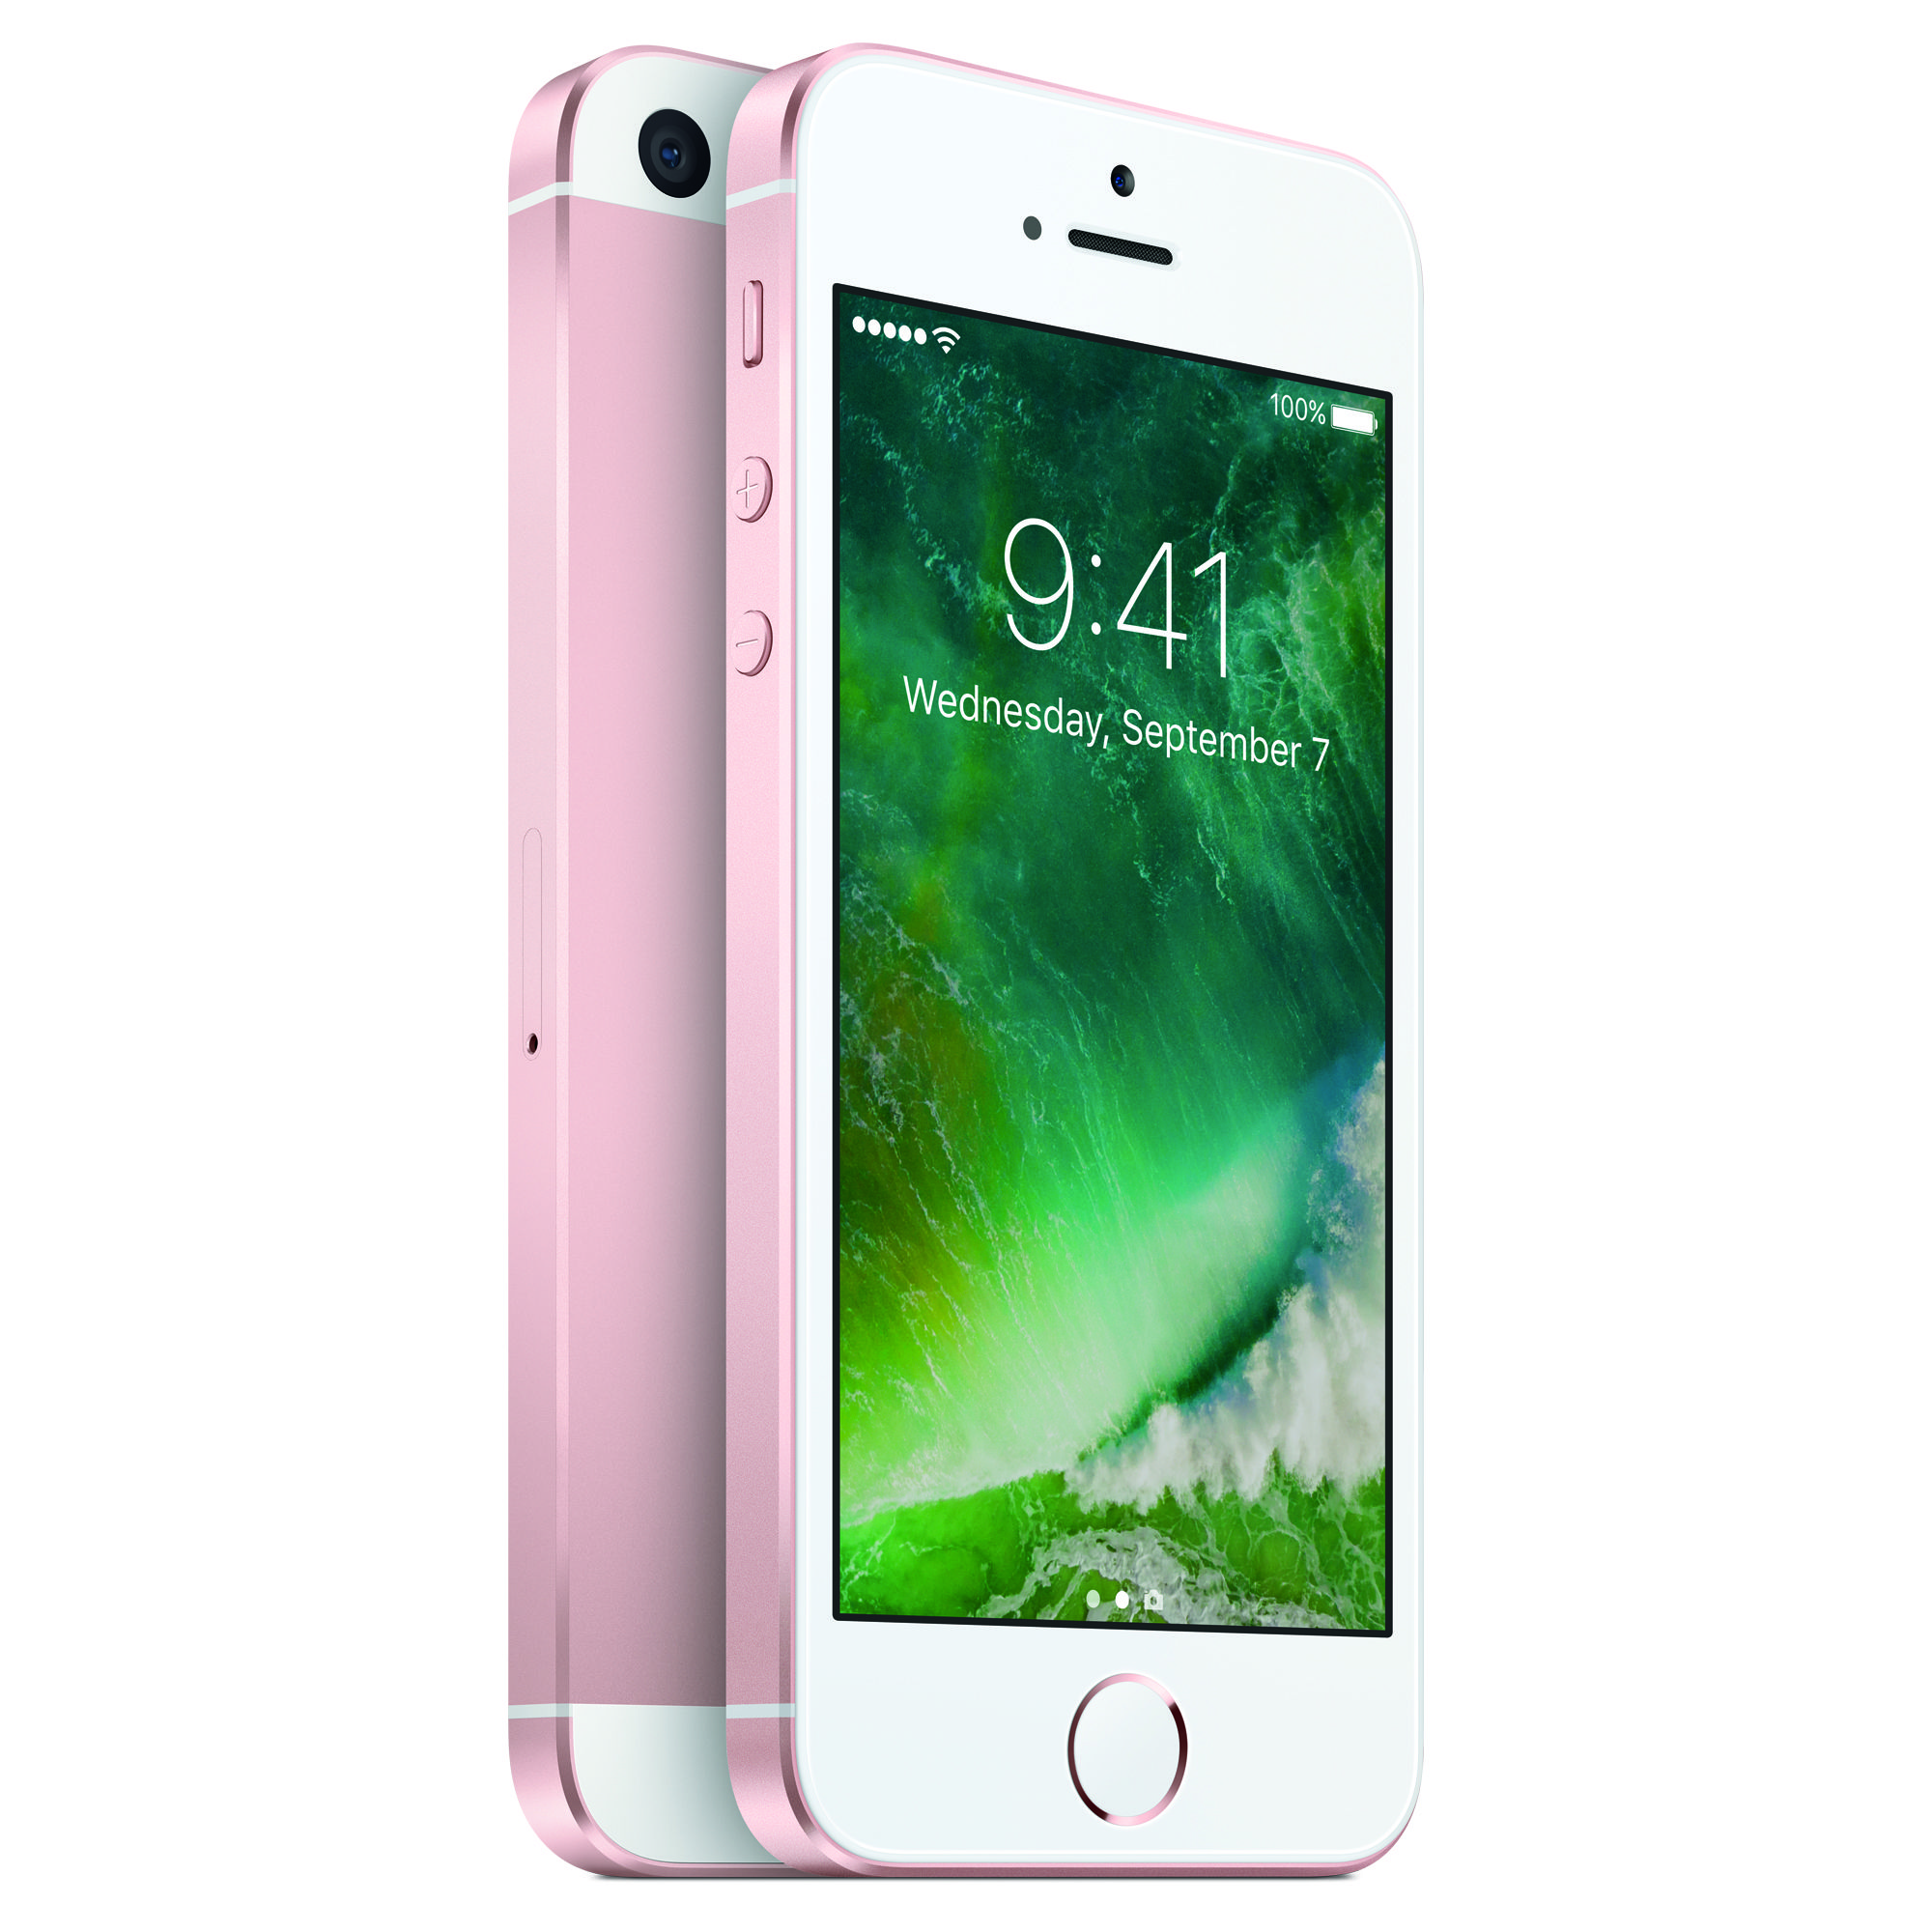 Cell Phones Apple iphone 6s, Iphone, Apple iphone 6s plus